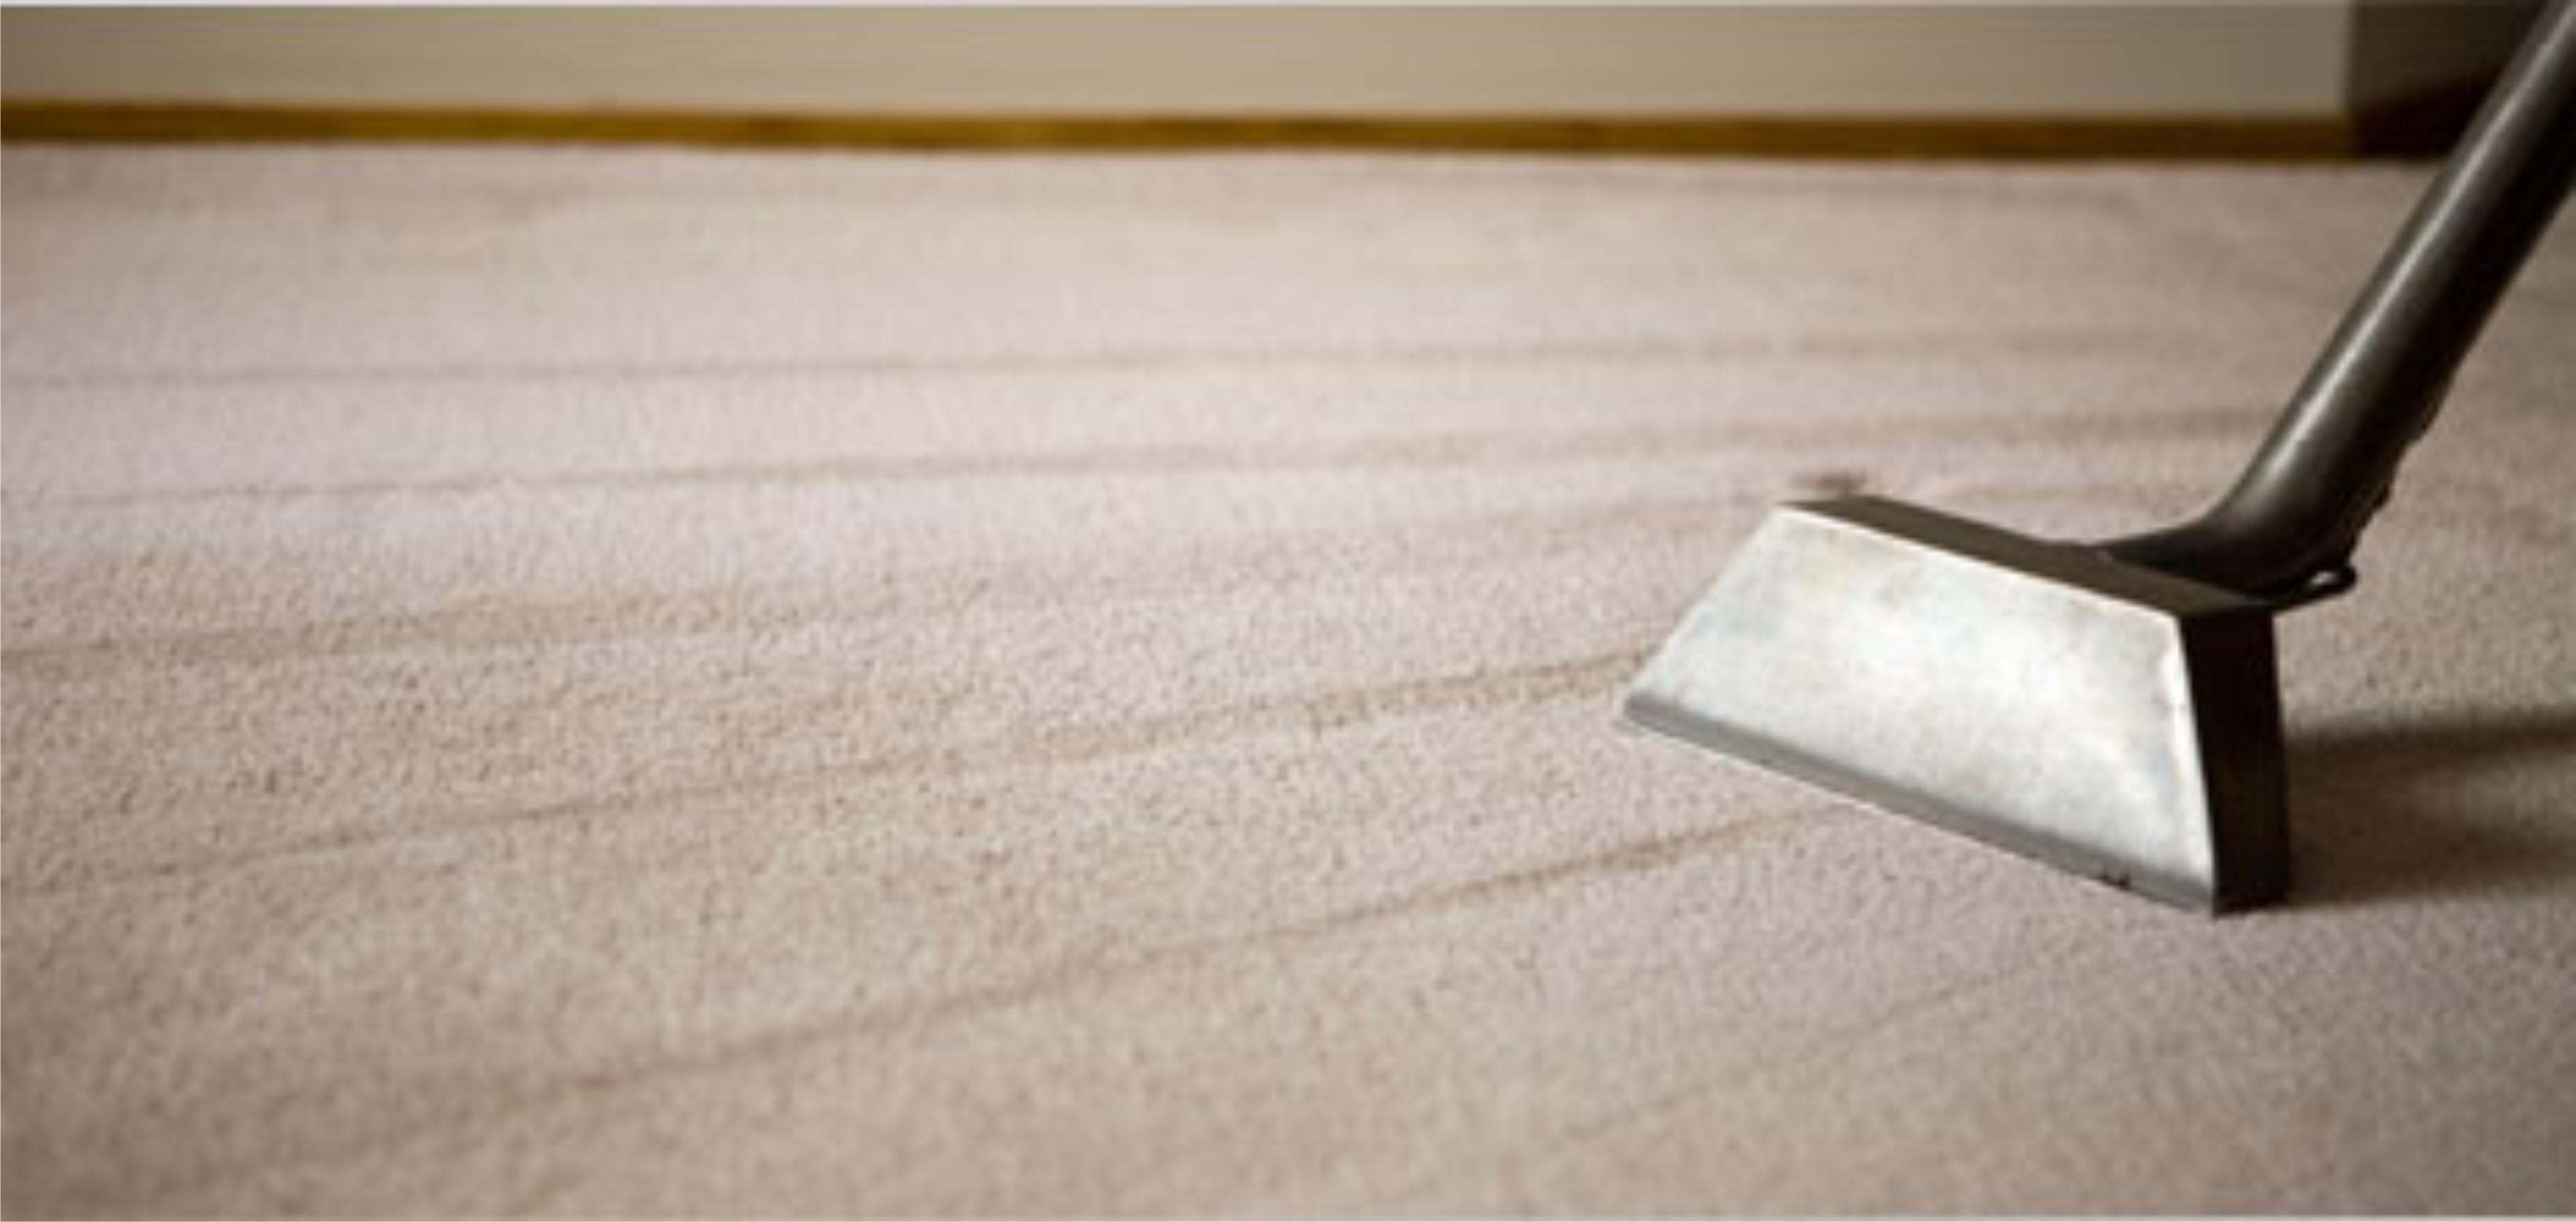 Flooring maintenance part two paradigm interiors carpet cleaner dailygadgetfo Choice Image